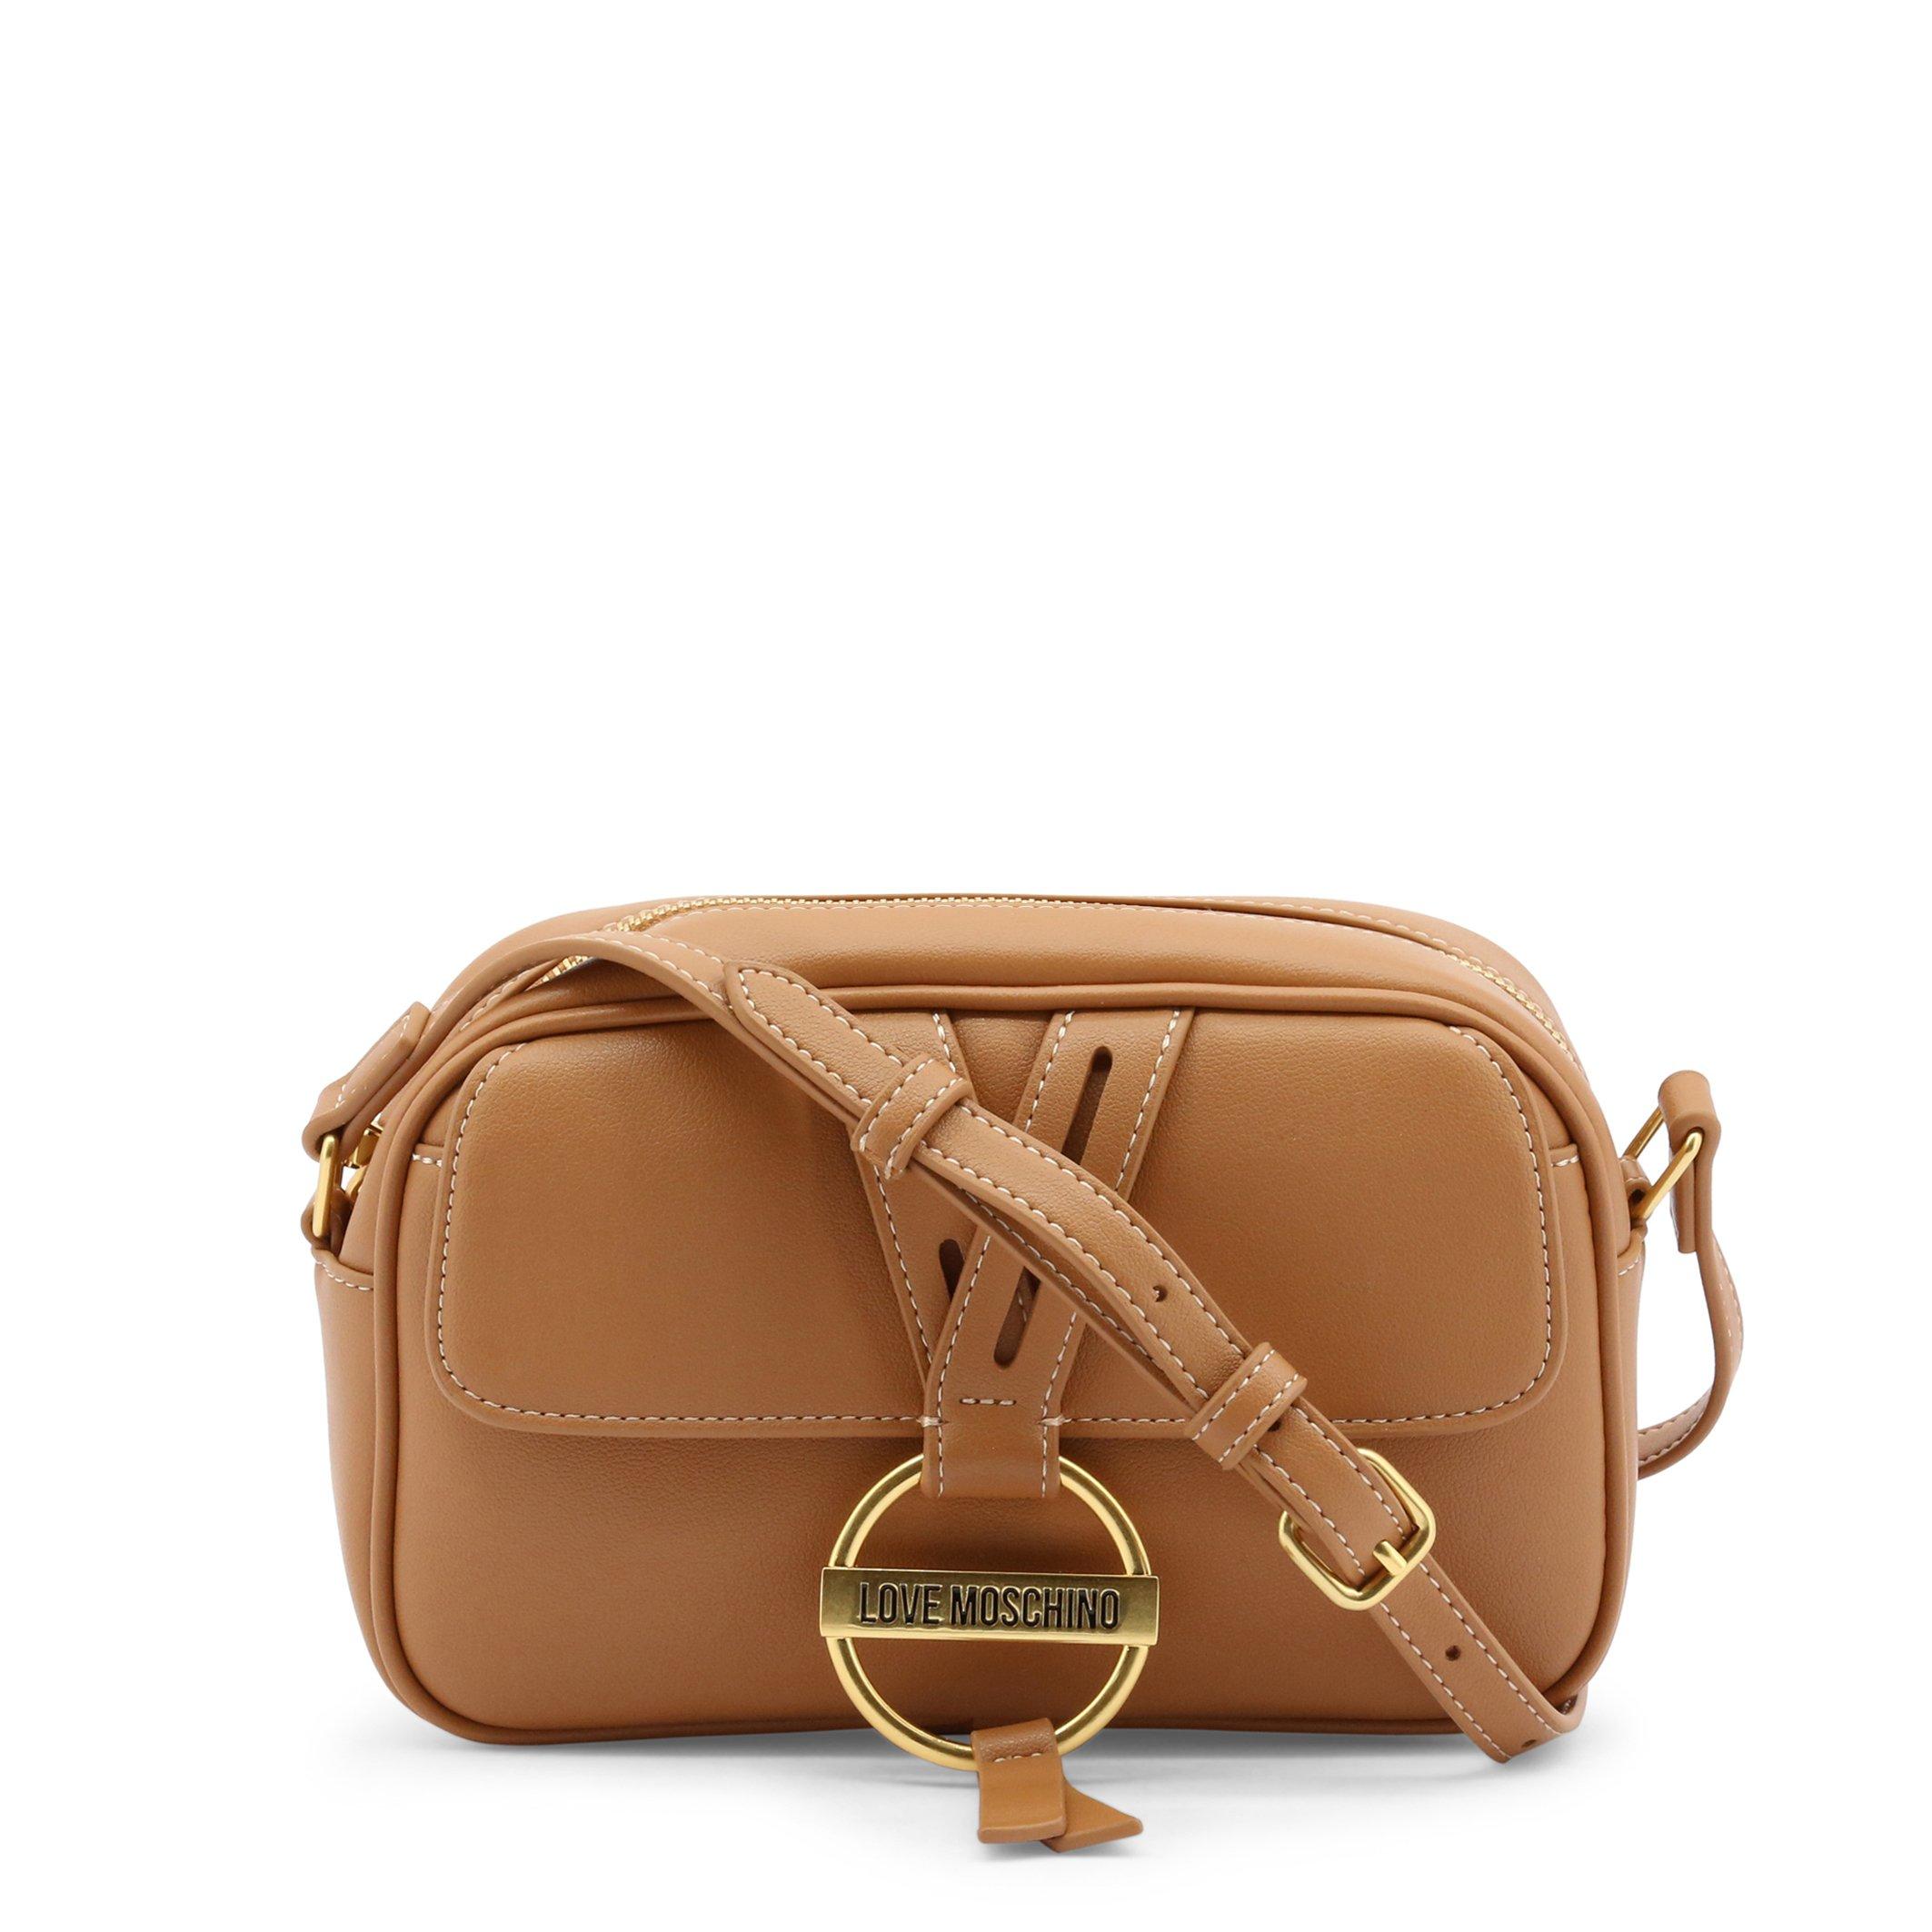 Love Moschino Women's Crossbody Bag Various Colours JC4201PP1DLK0 - brown NOSIZE